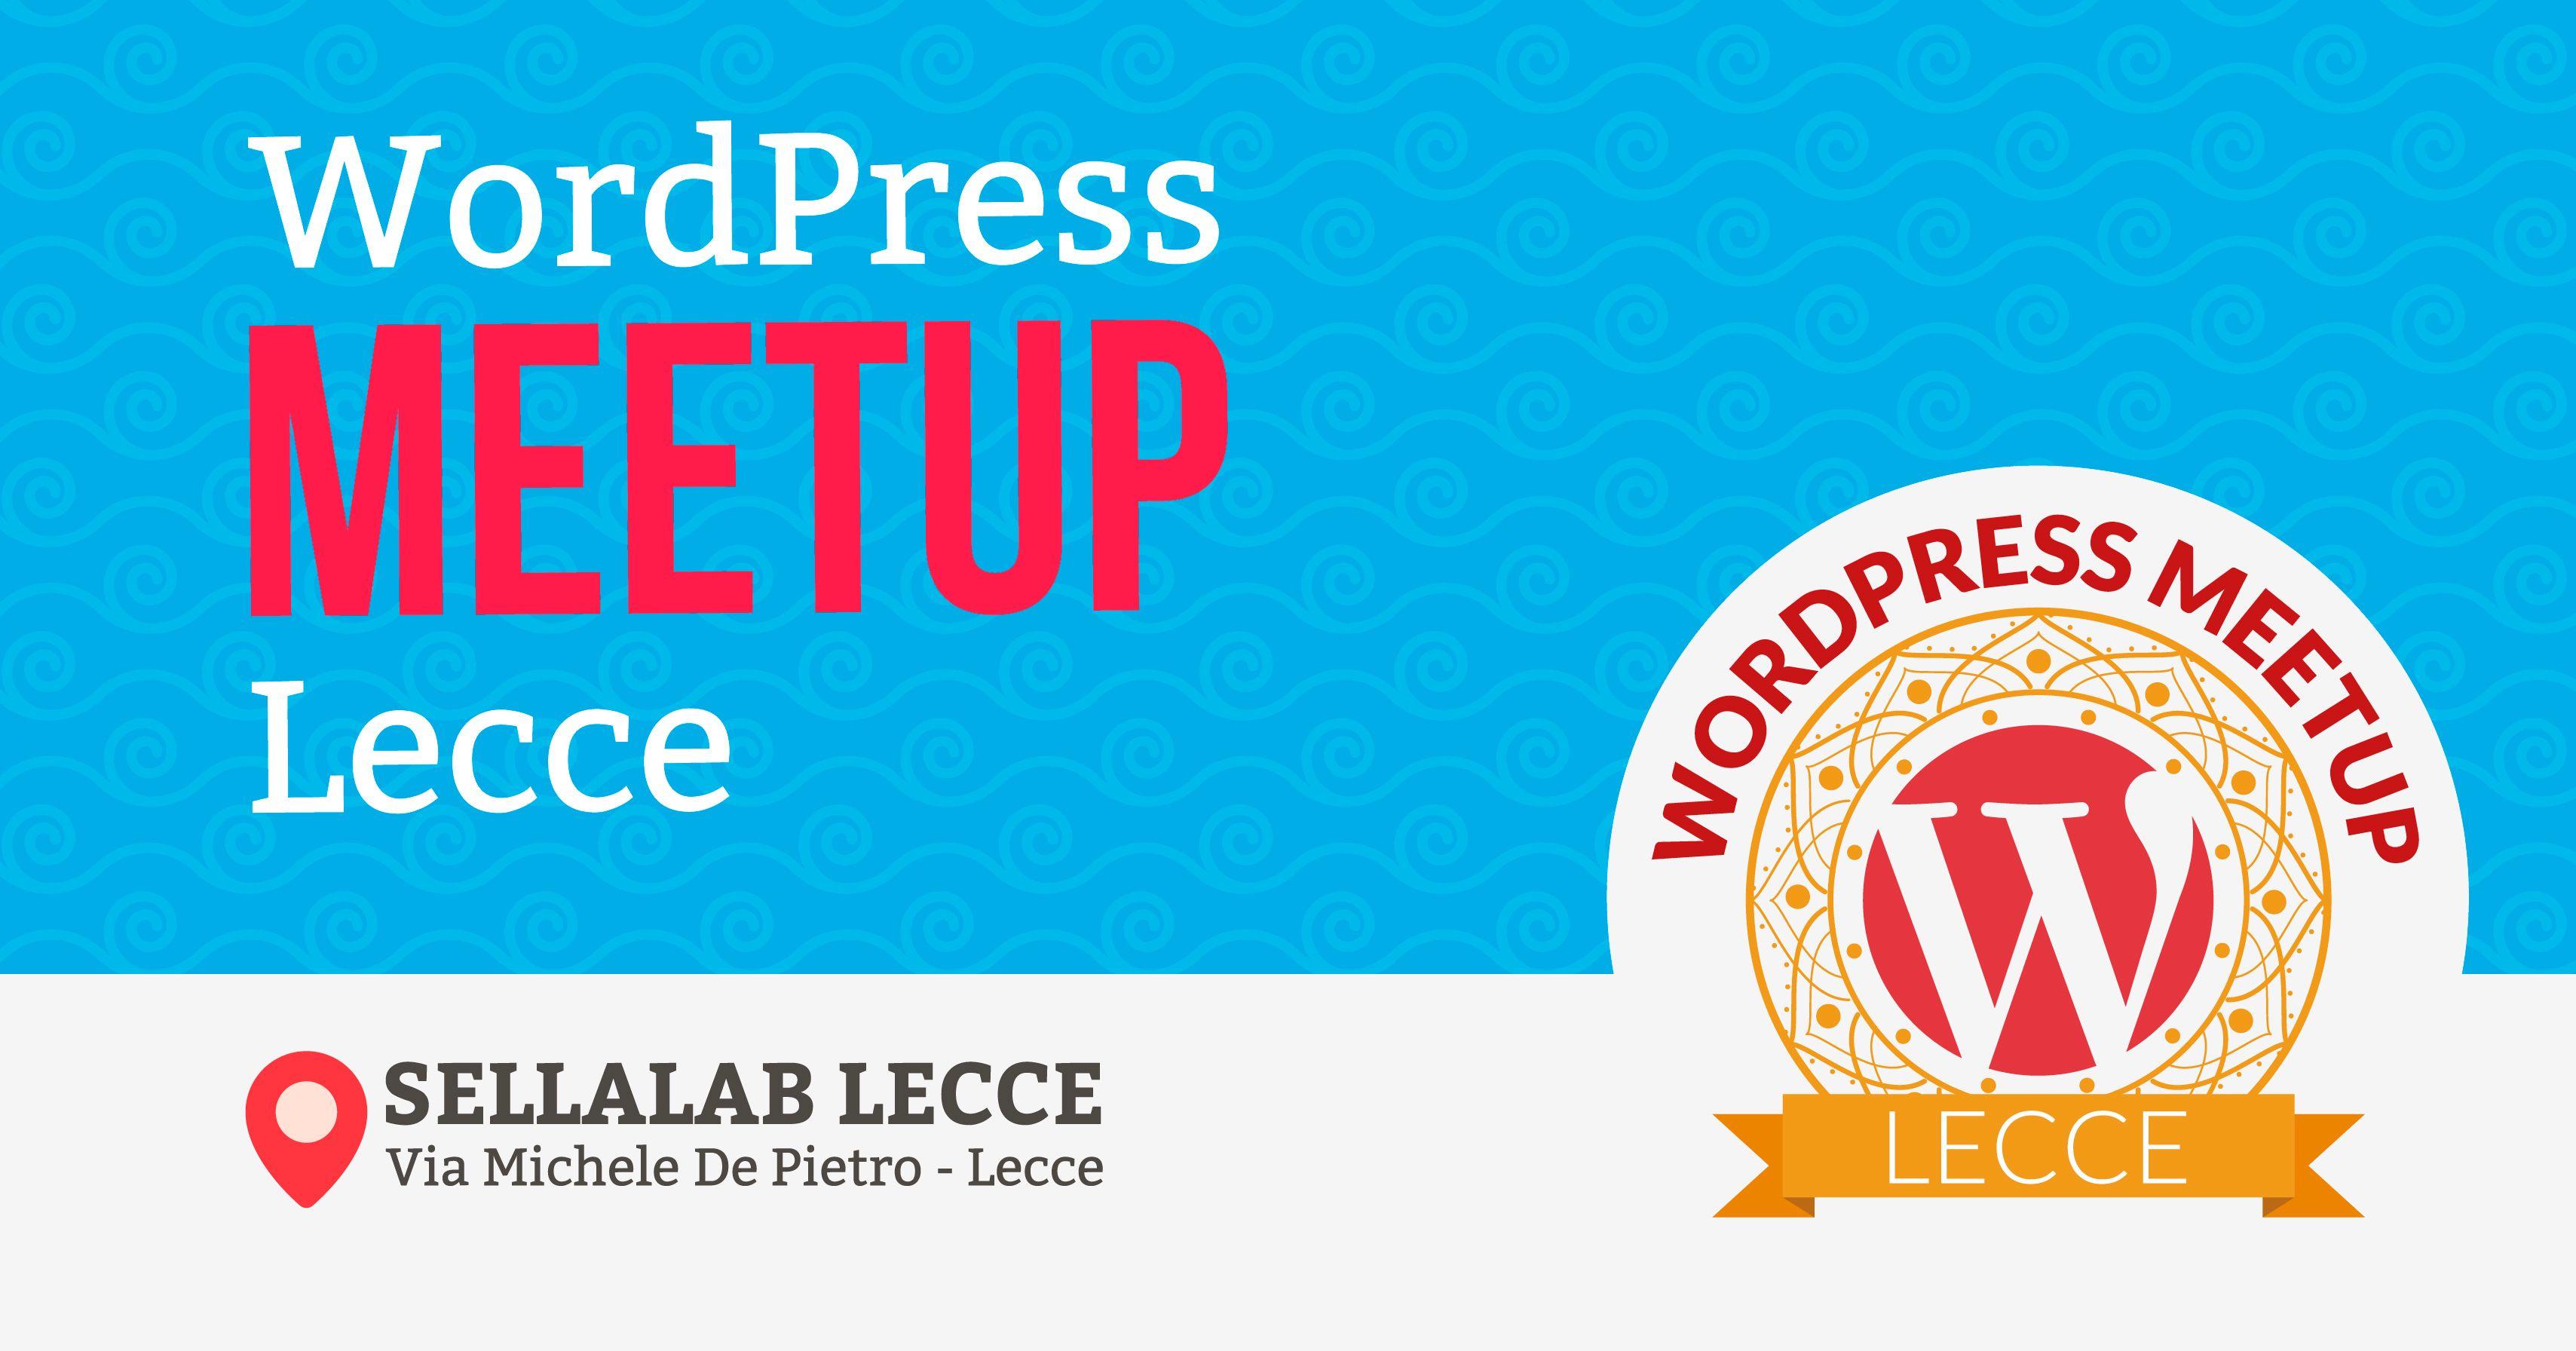 WordPress Meetup Lecce